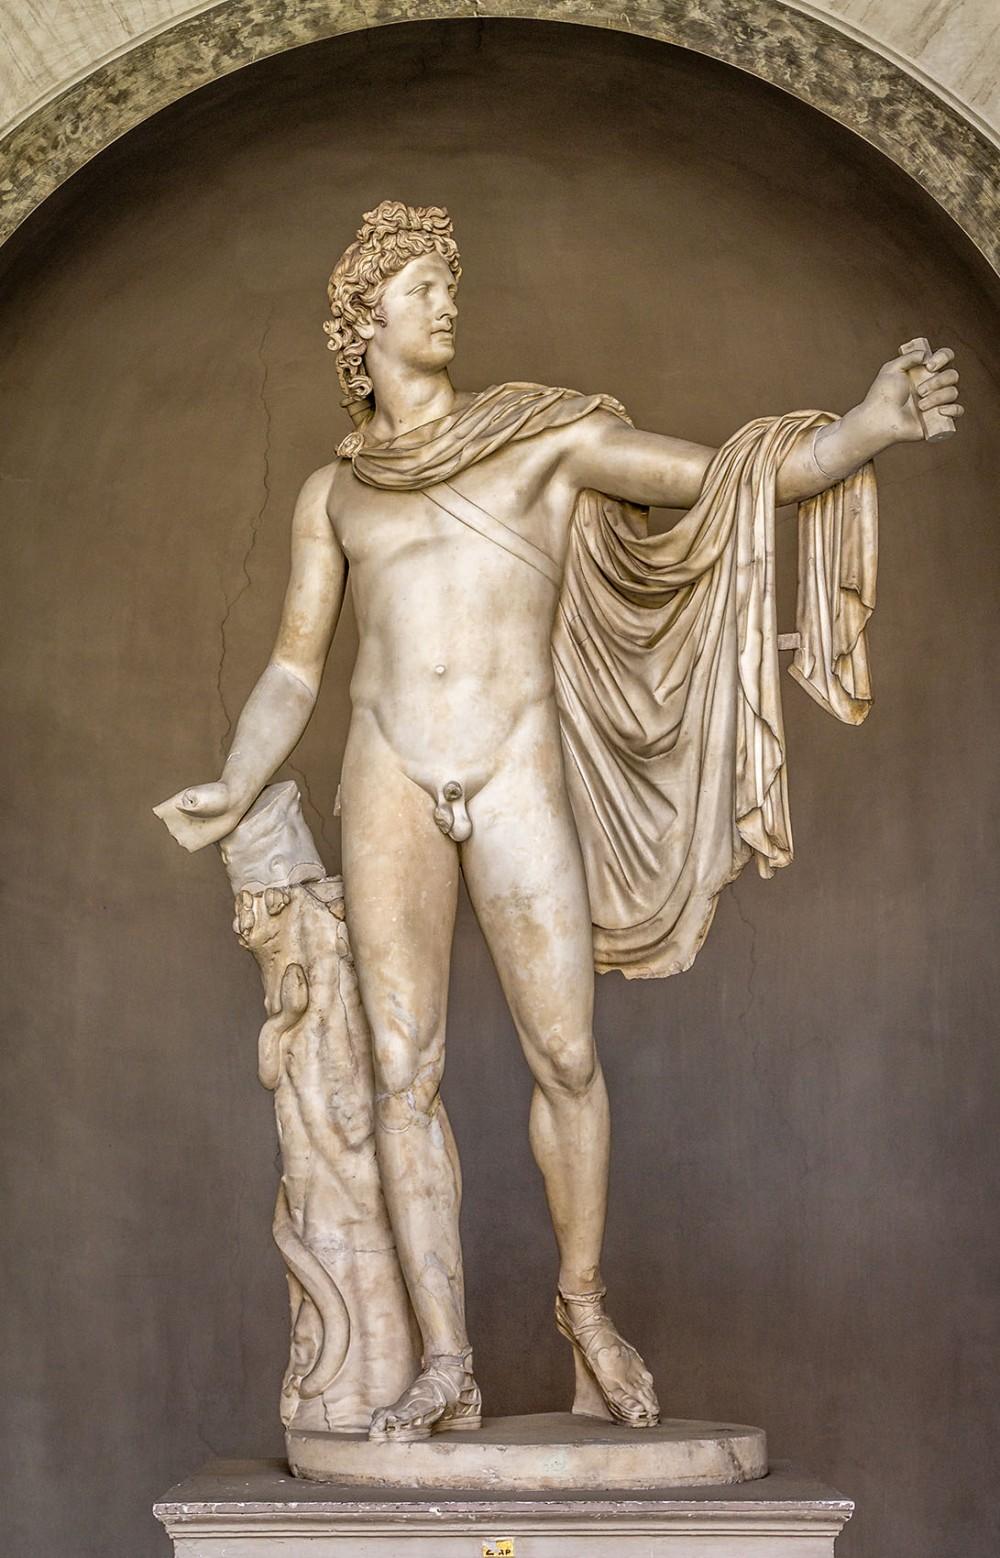 Leocares. Apolo del Belvedere. 350 a.C. Museos Vaticanos. Roma.